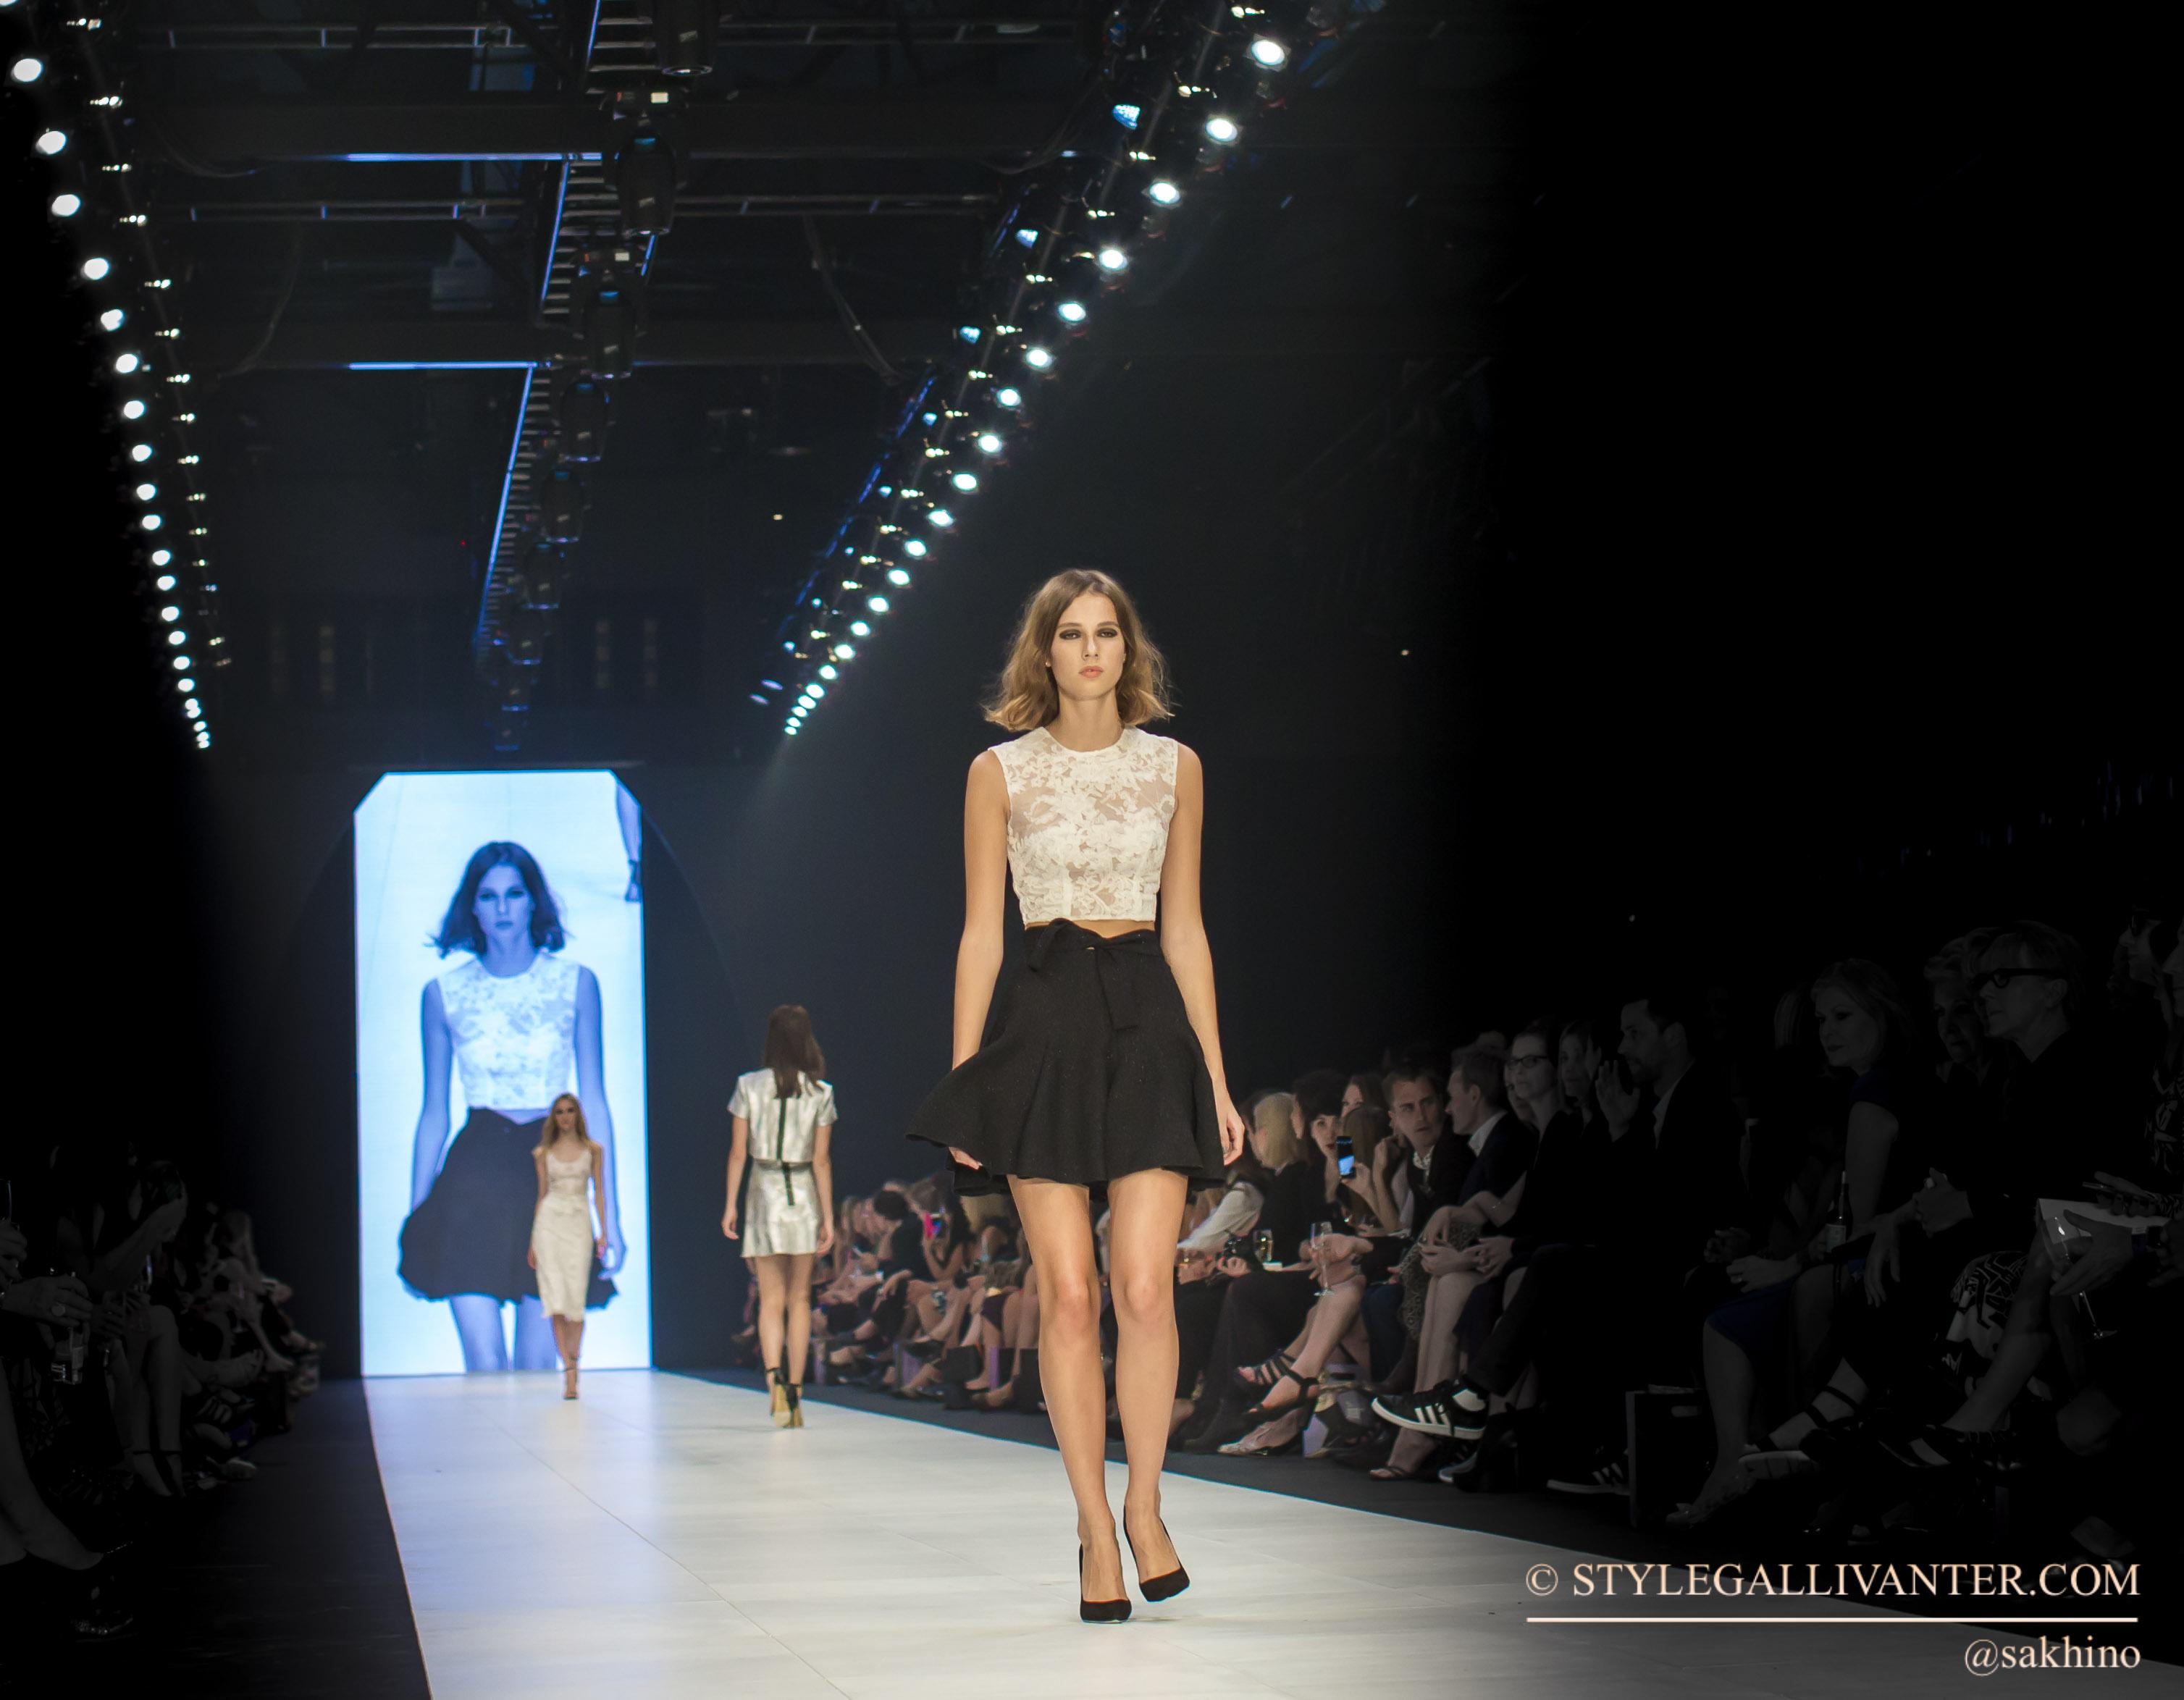 stylegallivanter_VAMFF-2015_VAMFF2015_VAMFF15_MELBOURNE-FASHION-WEEKS-2015_best-dressed-VAMFF-2015_YEOJI-BAE-VAMFF-2015_VAMFF-bloggers-2015_CARLA-ZAMPATTI-2015-VAMFF-7